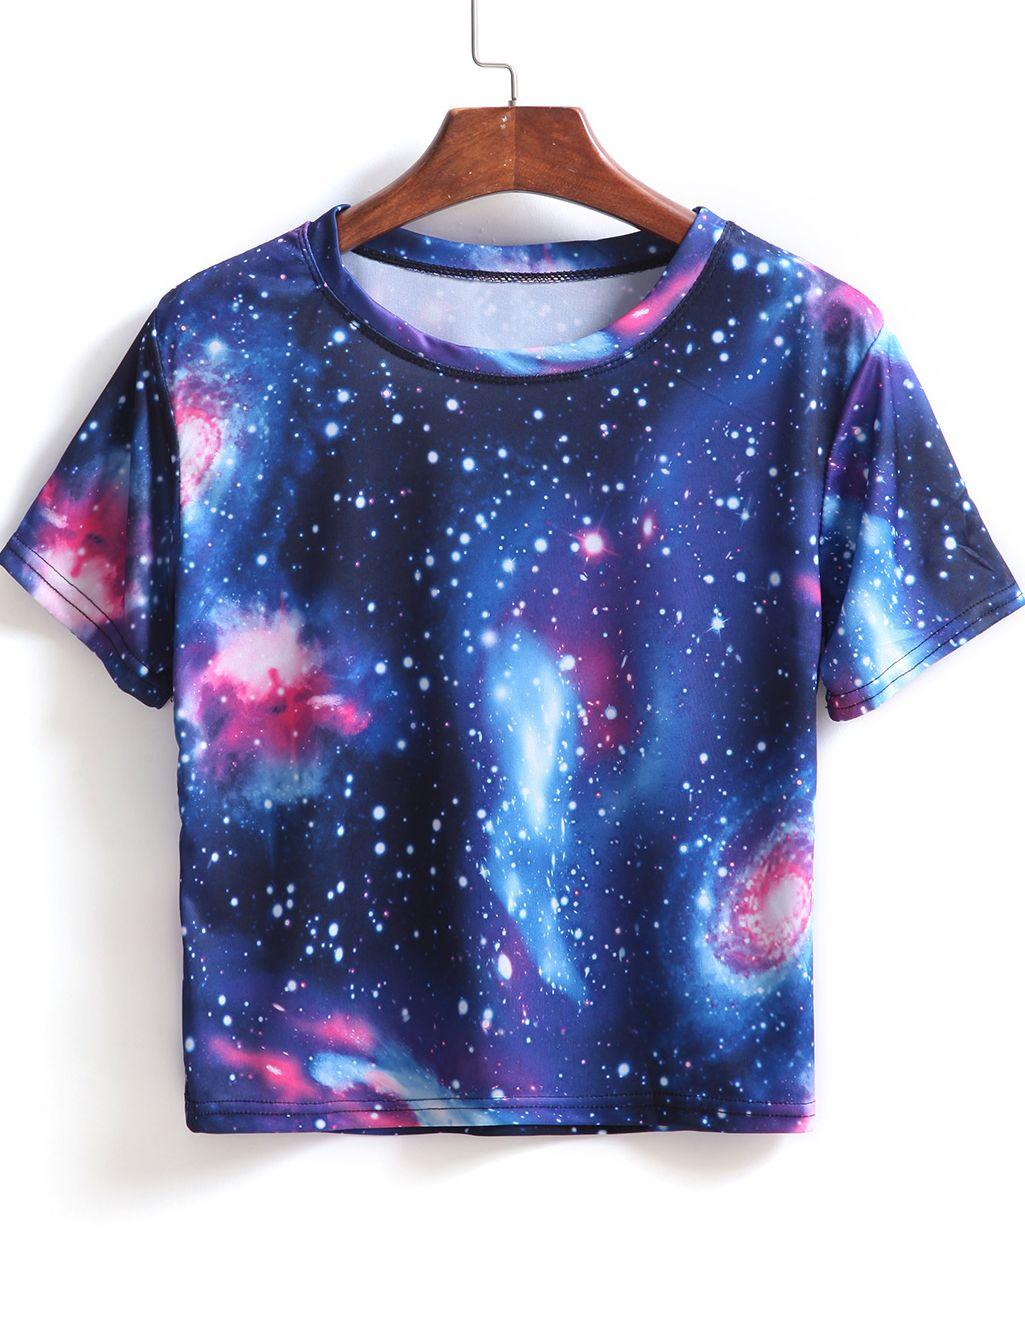 Pinterest Crop Azul Manga Moda Camiseta 35 7 Galaxia Corta 4nSfSB8Aq